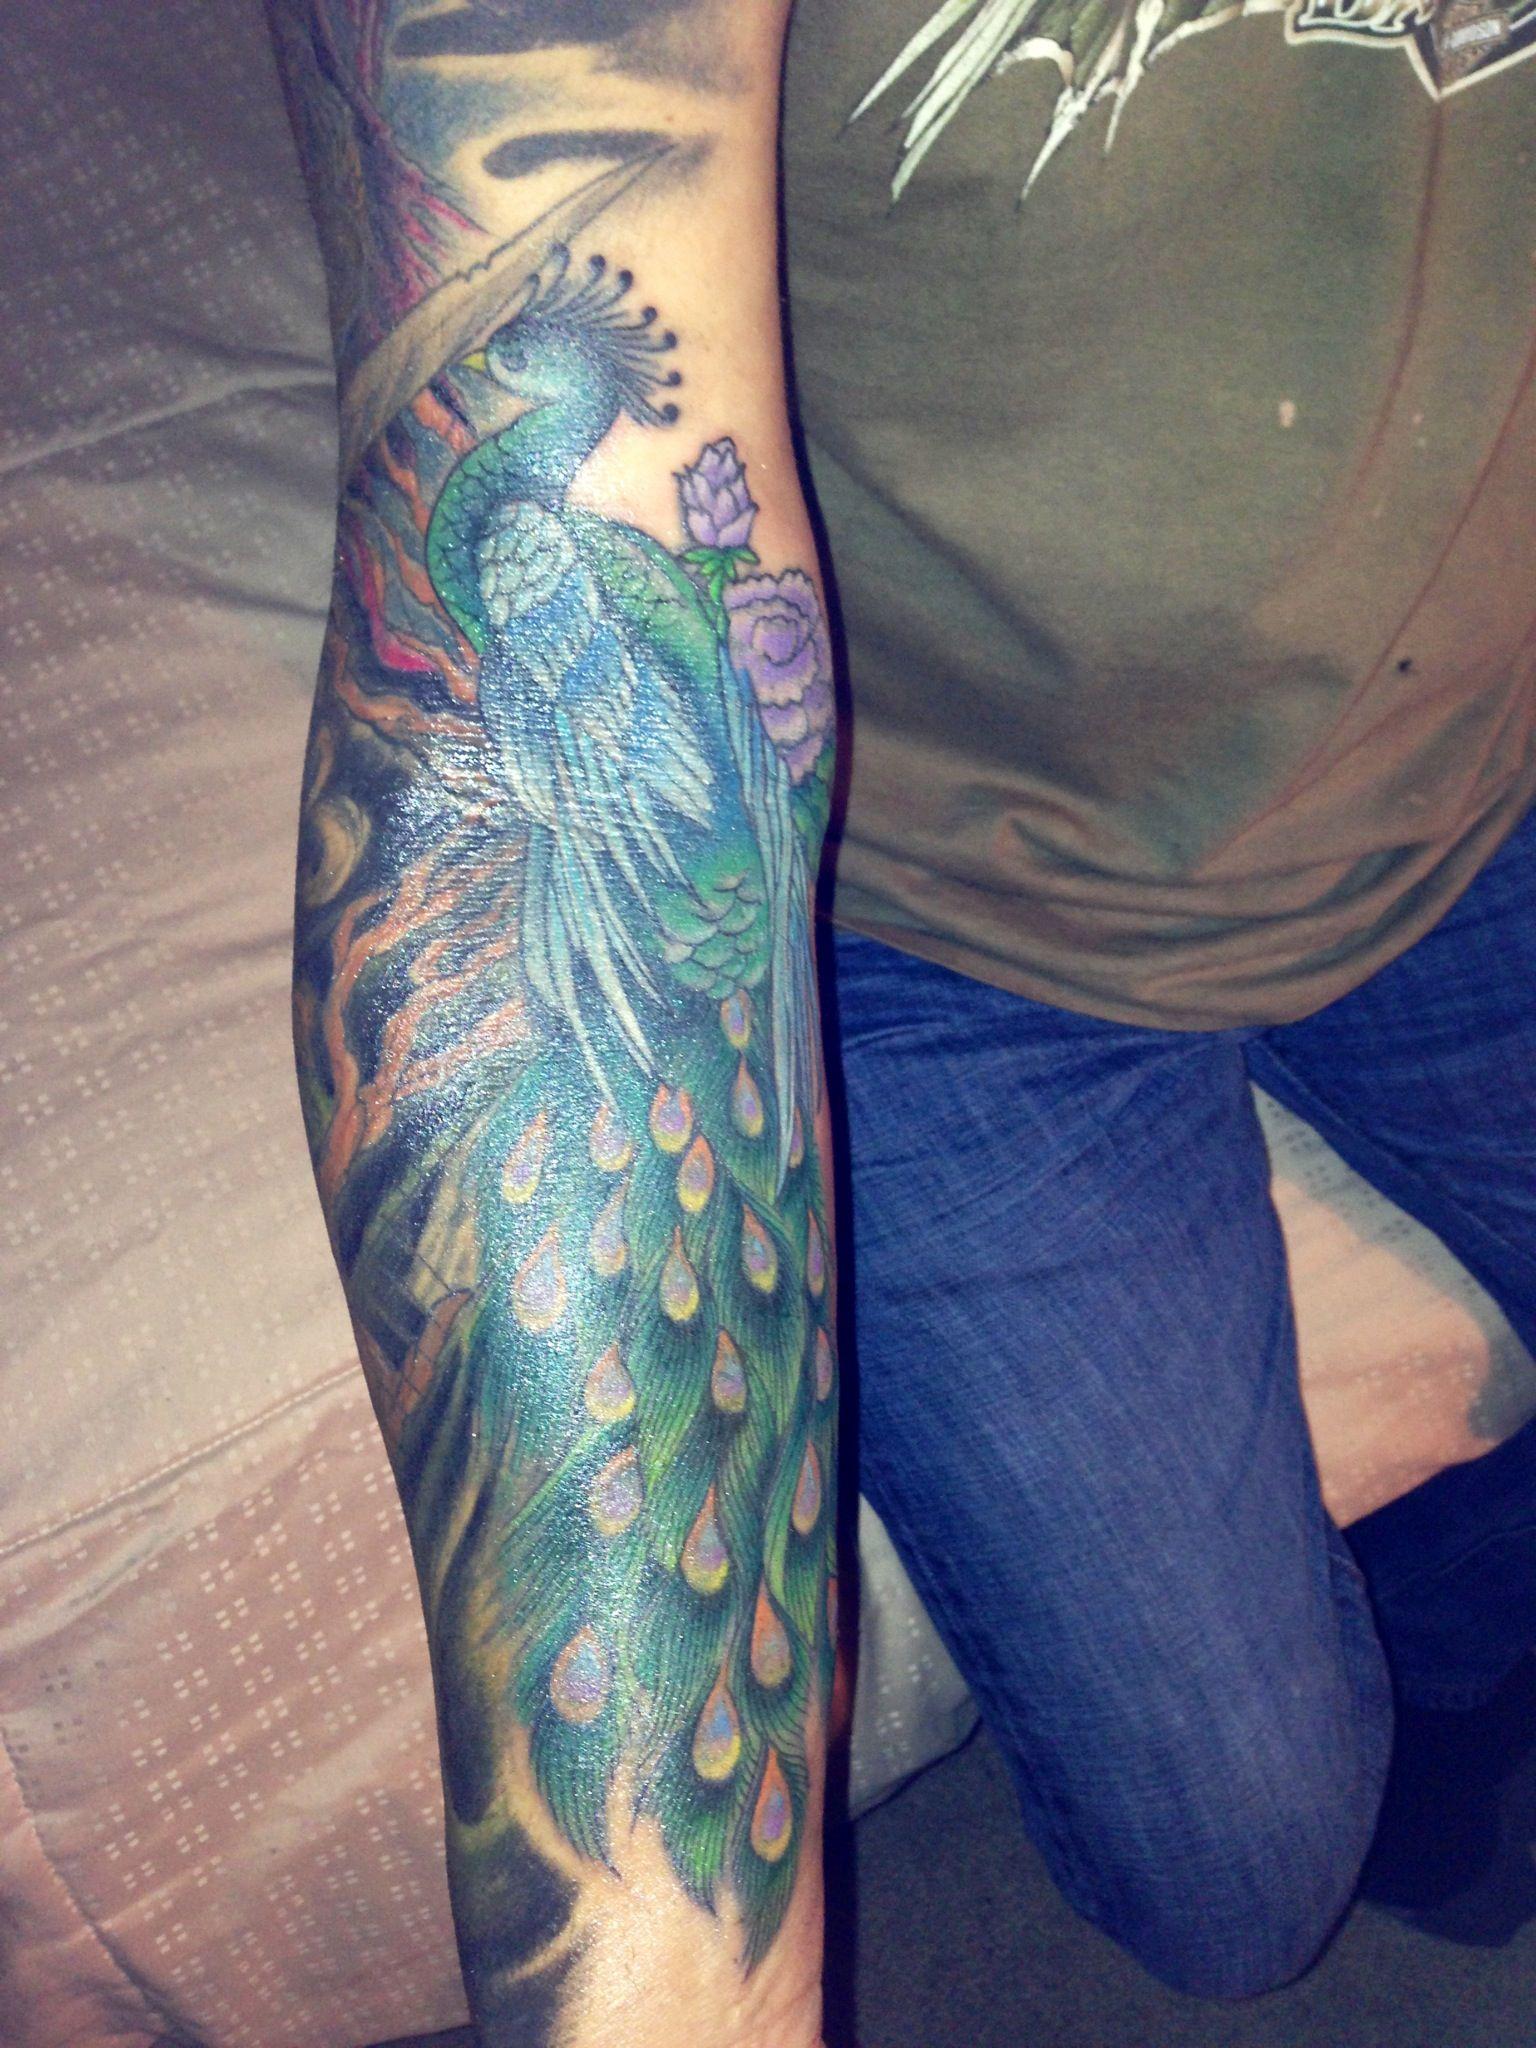 Rapper Cardi B Peacock Tattoo: Tattoo - Mostly Peacock